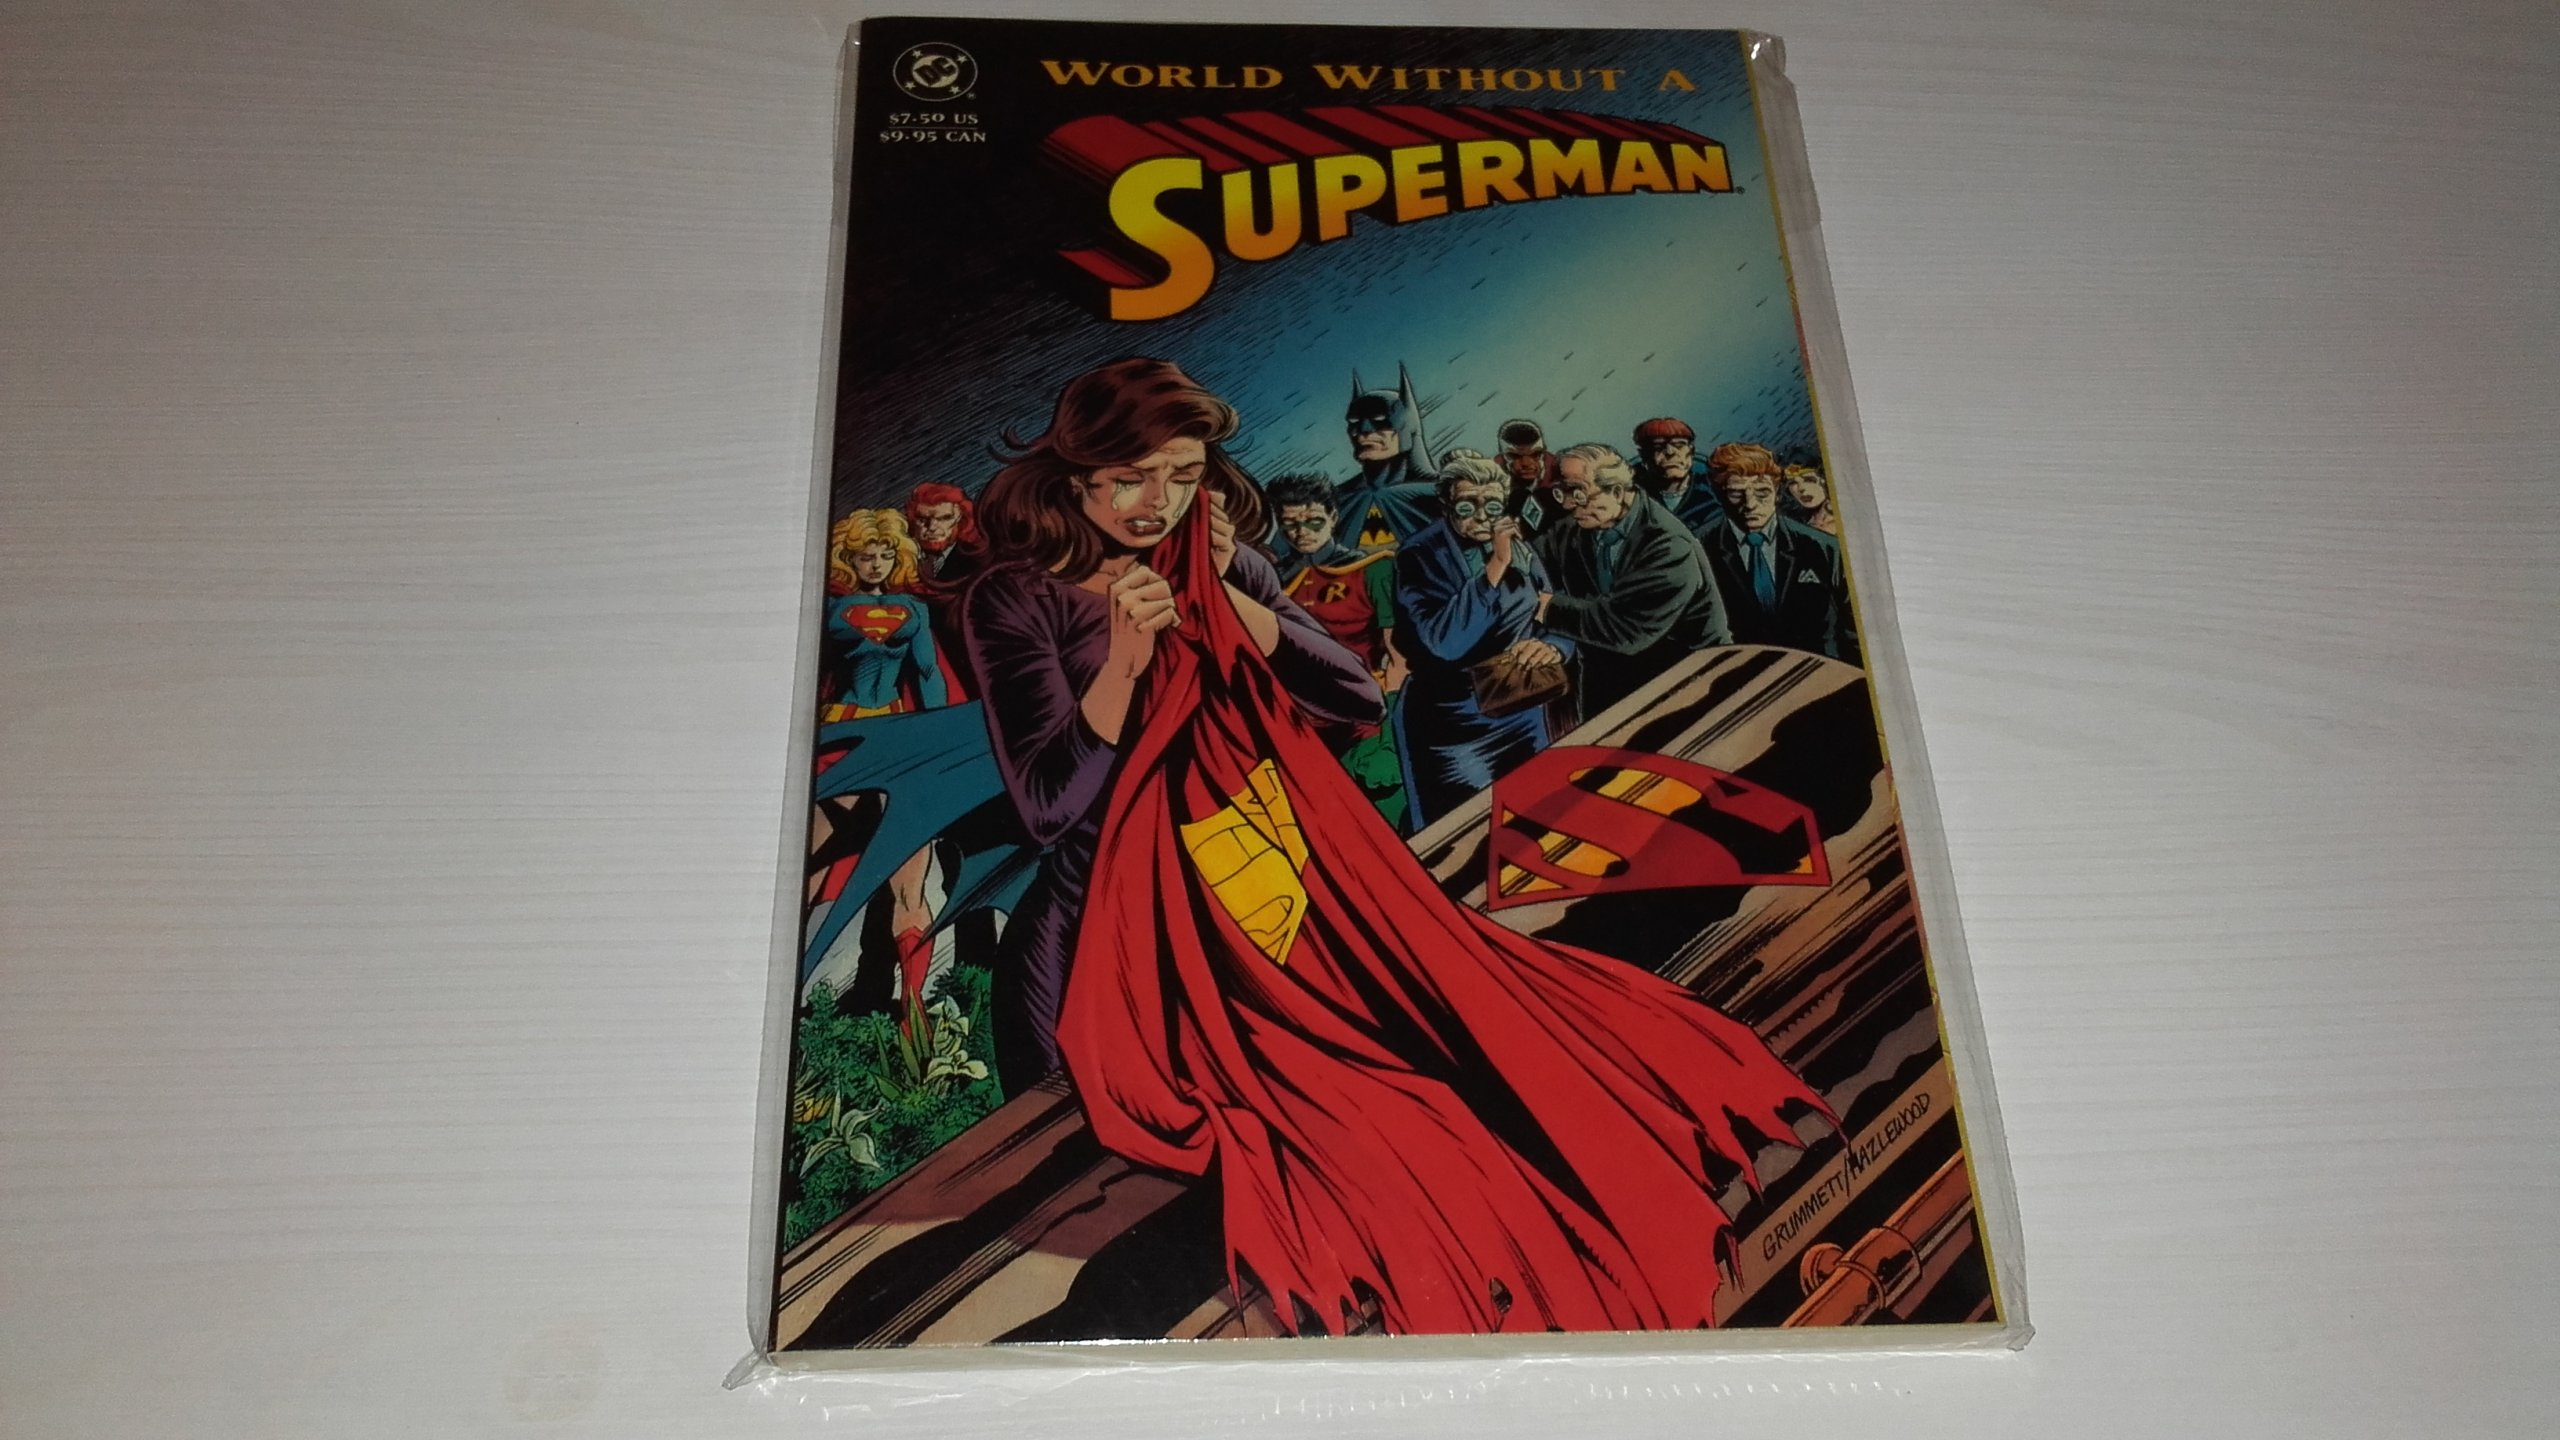 SUPERMAN: A WORLD WITHOUT A SUPERMAN. DAN JURGENS